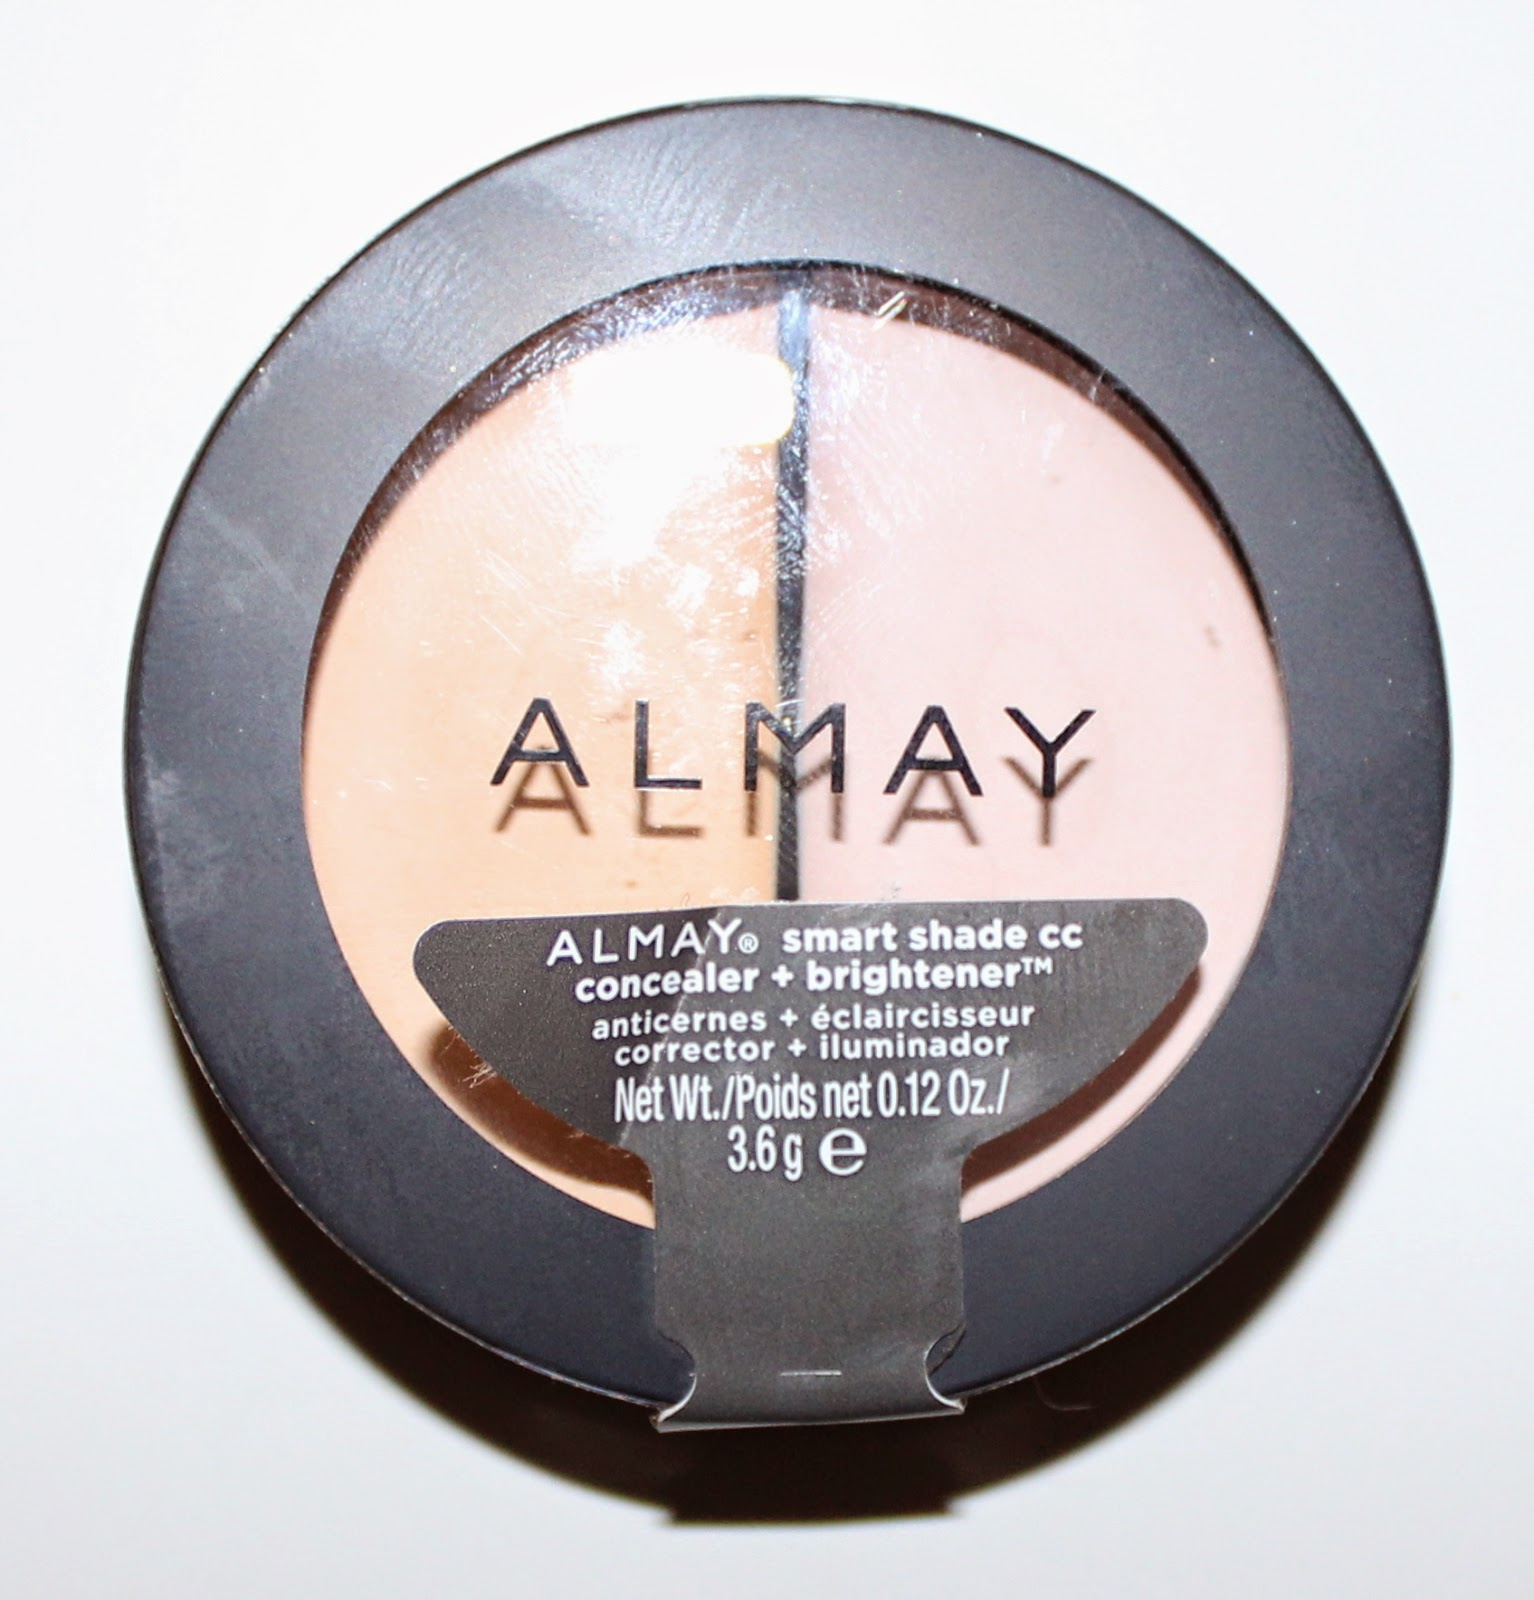 Almay Smart Shade CC Concealer + Brightener in 100 Light